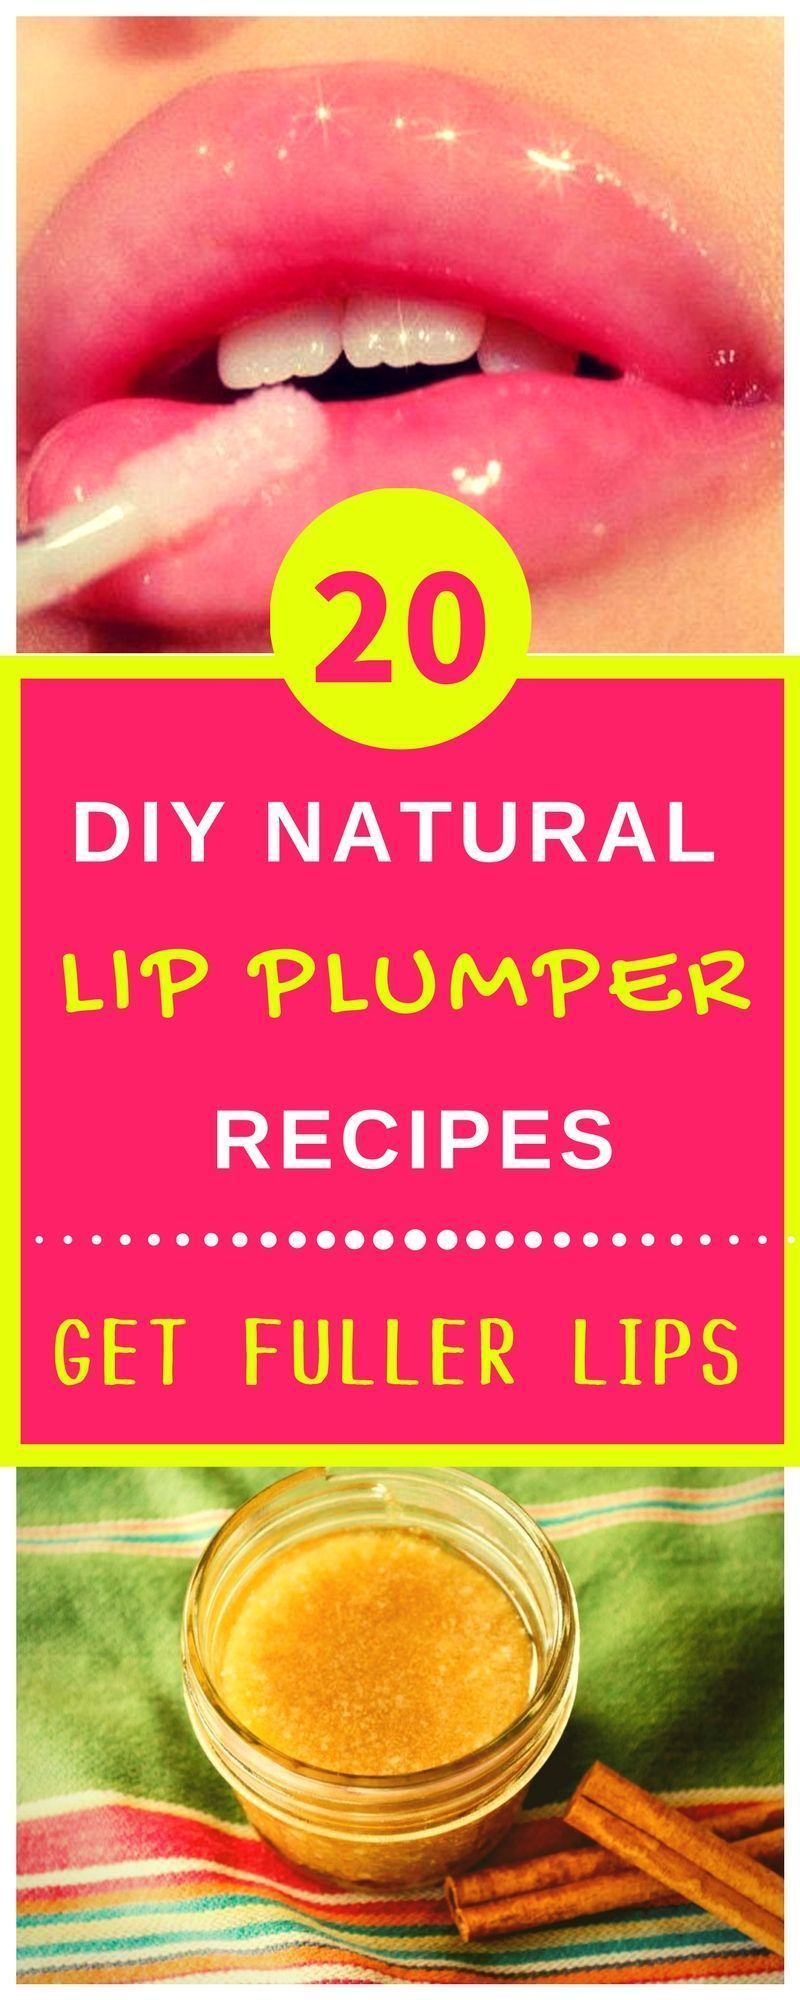 20 trustworthy natural diy lip plumper recipes for fuller